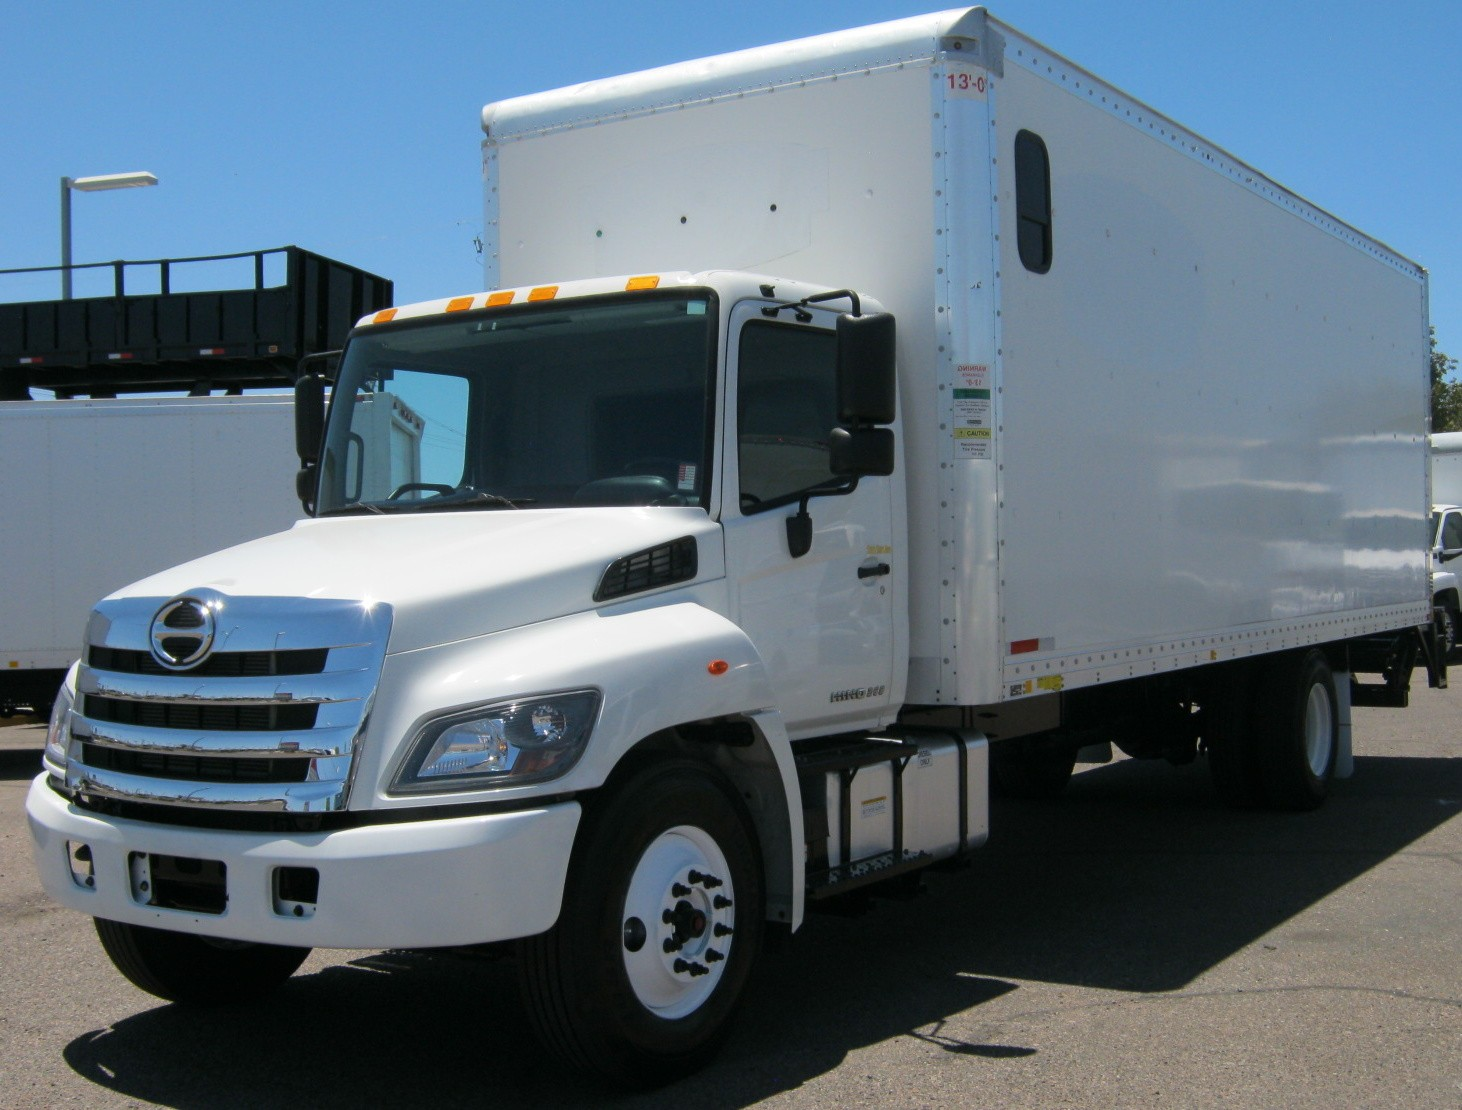 Arizona Commercial Truck Sales, Truck Rental, Truck Service